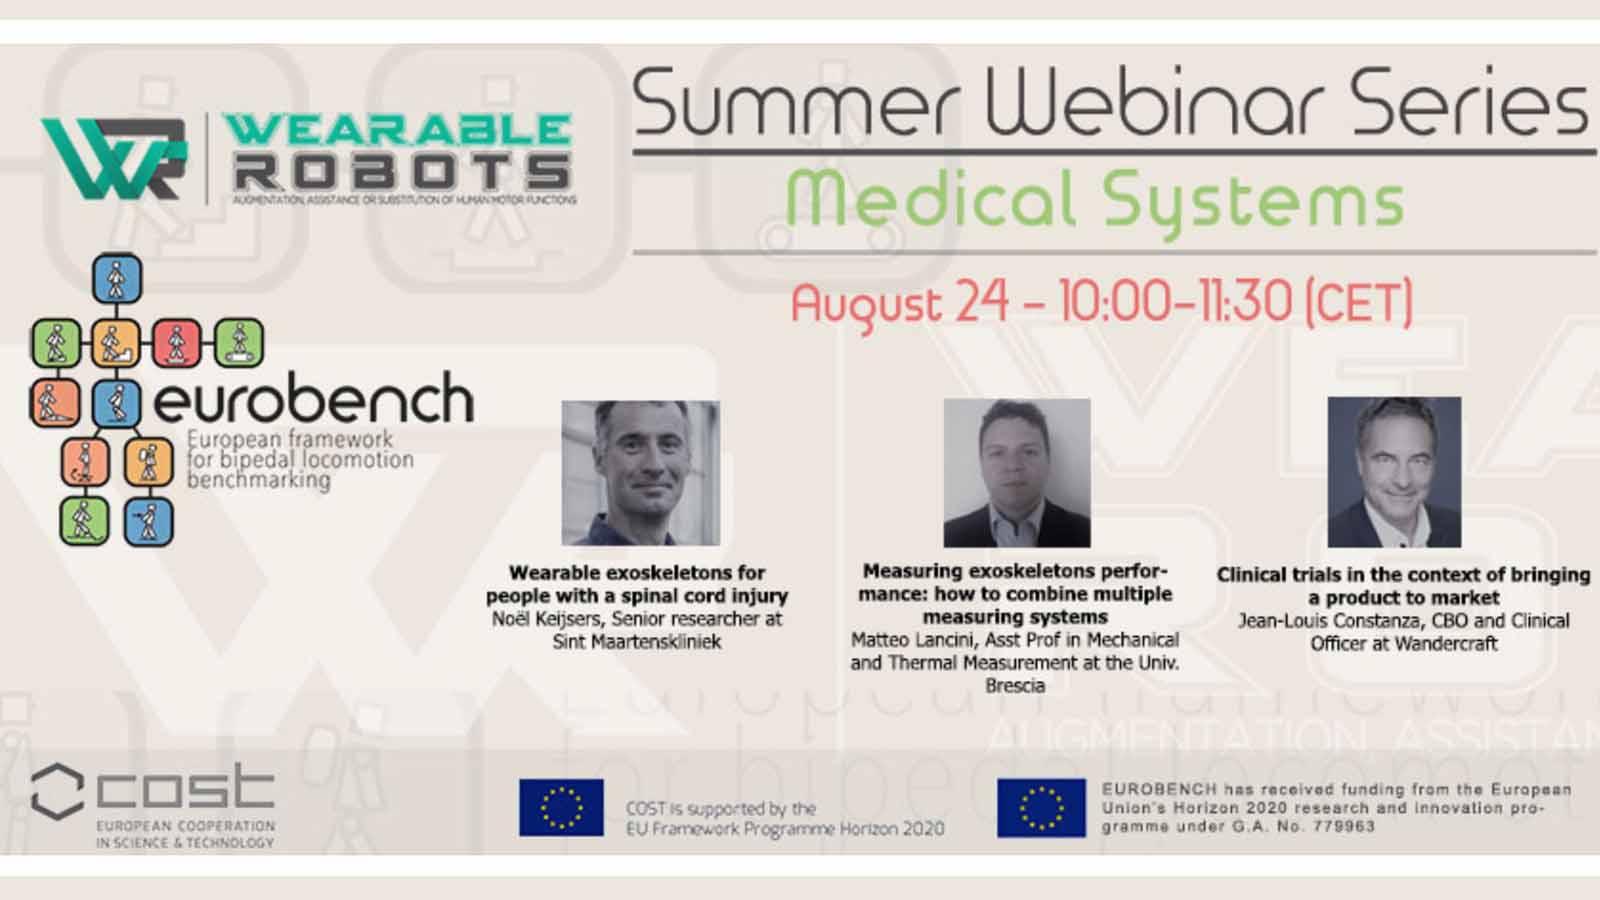 Summer Webinar Series Medical Systems